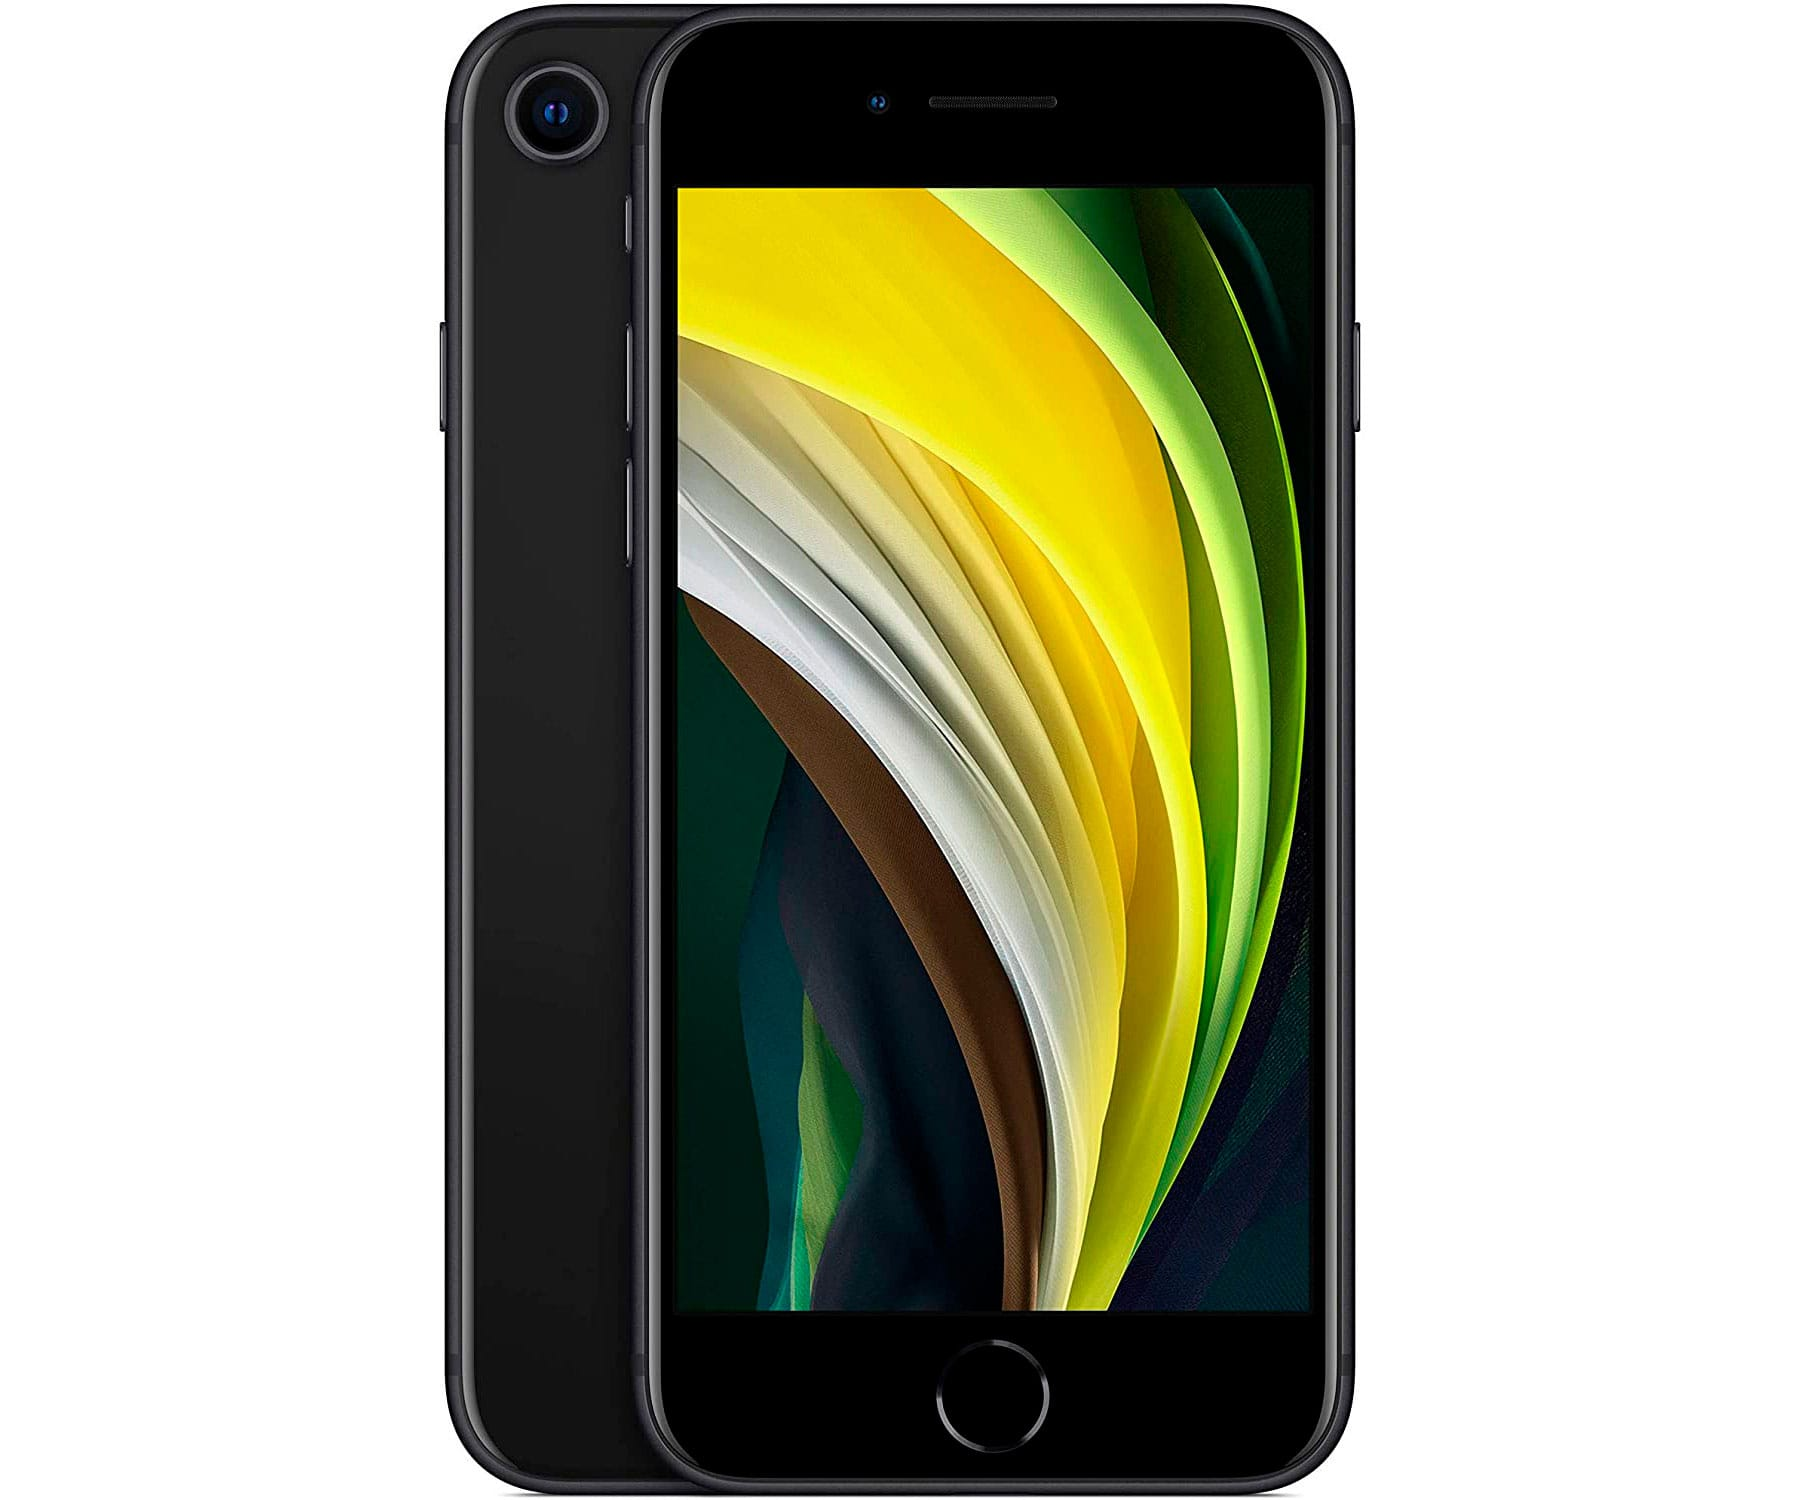 APPLE IPHONE SE 2020 256GB NEGRO MÓVIL 4G 4.7''/A13/256GB/3GB RAM/12MP (E)